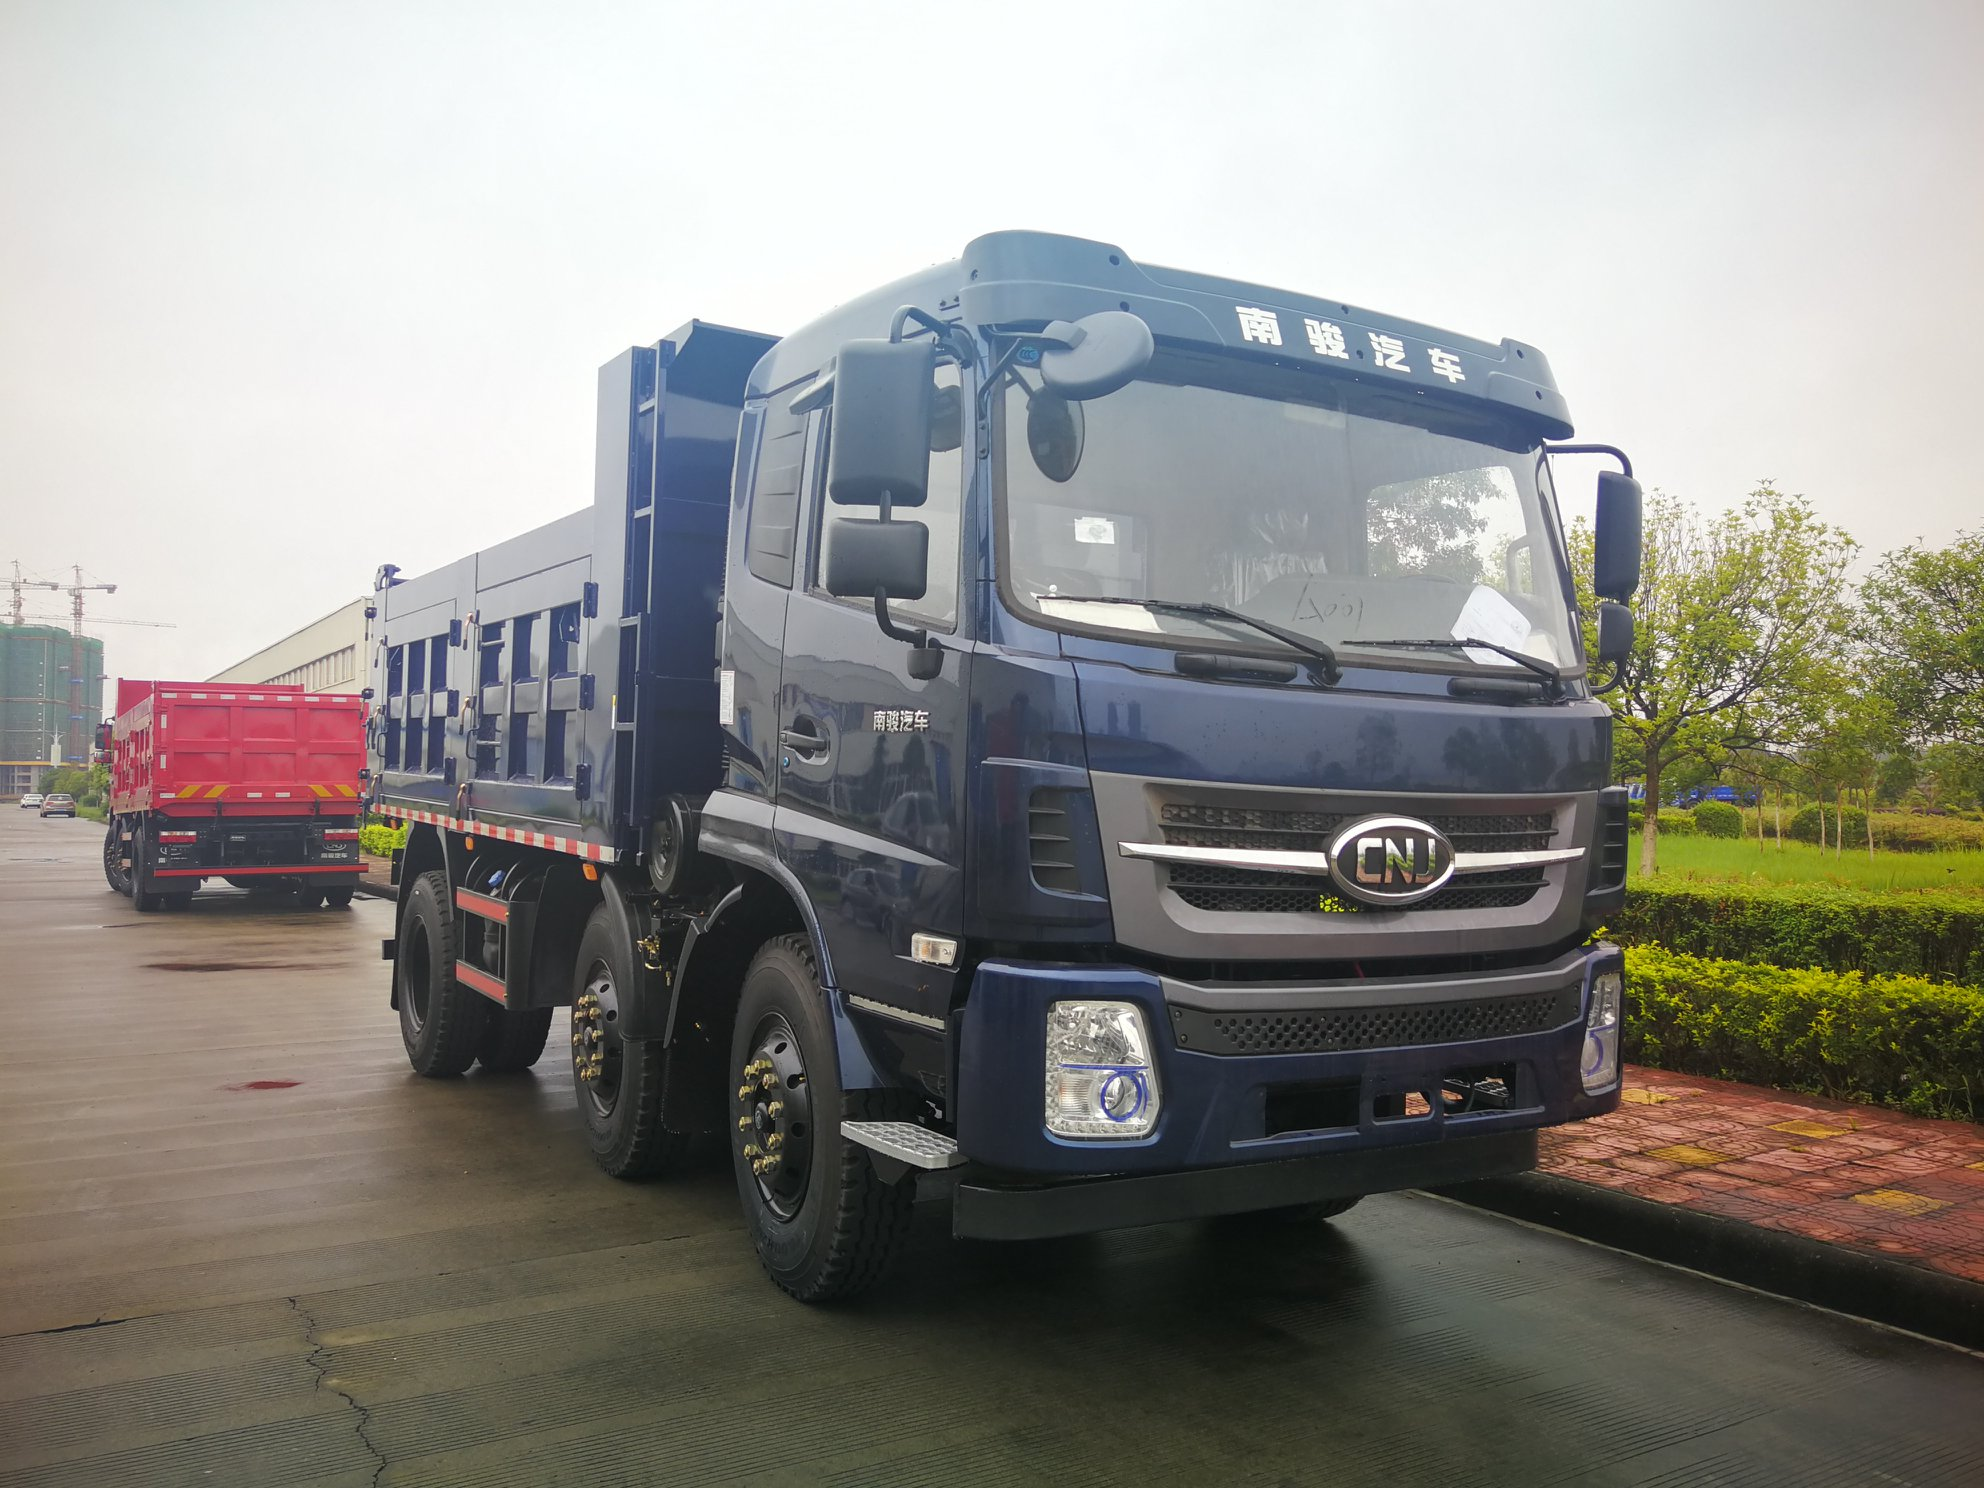 Dumper---diesel-motor-van-80-pk-tot-180-pk---lading-van-4-ton-tot-20-ton14